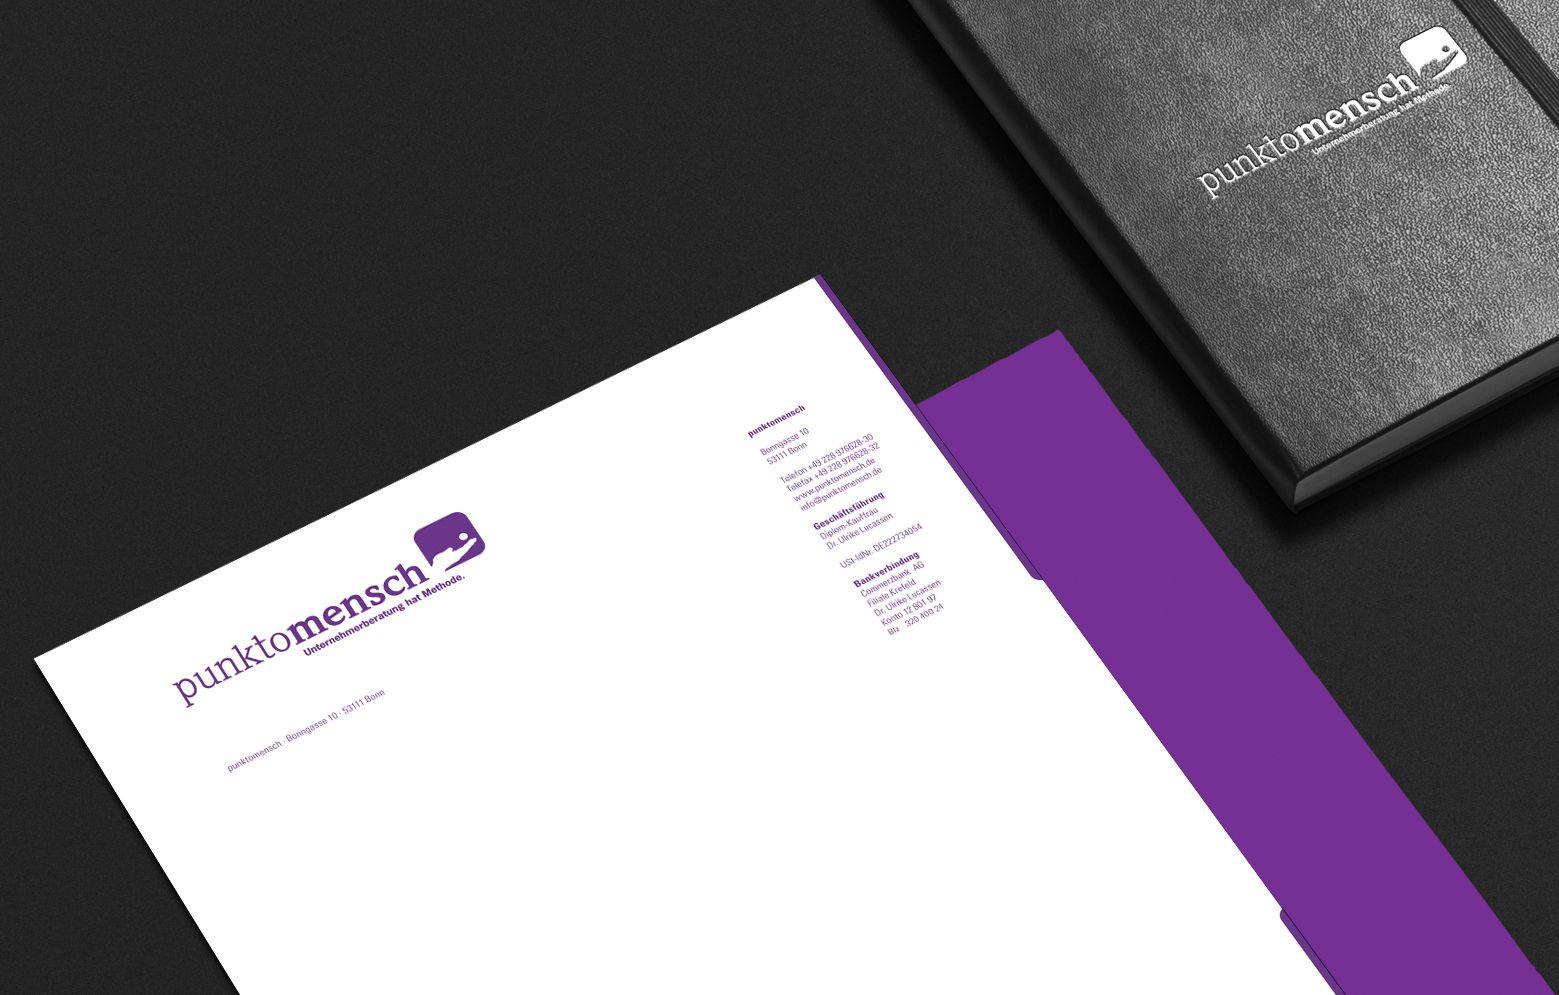 punktomesch Briefbogen Close-Up